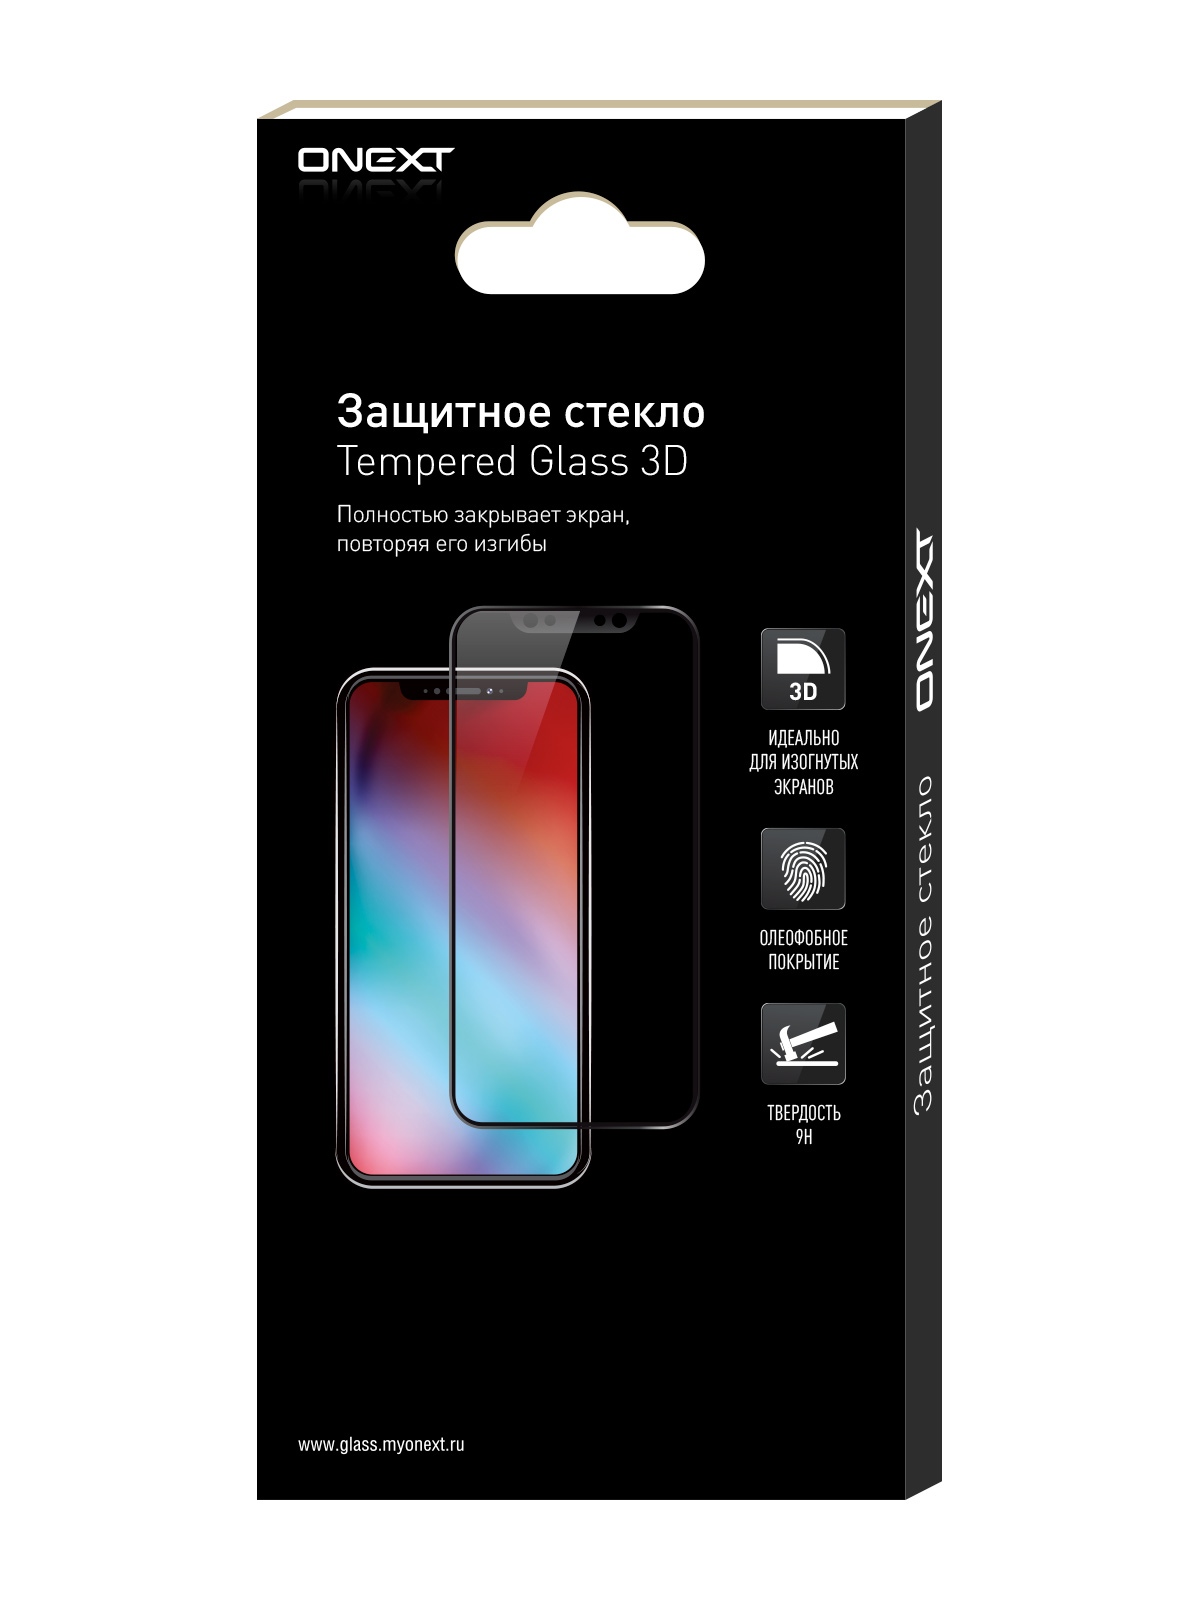 Защитное стекло ONEXT для Apple iPhone 8 Black